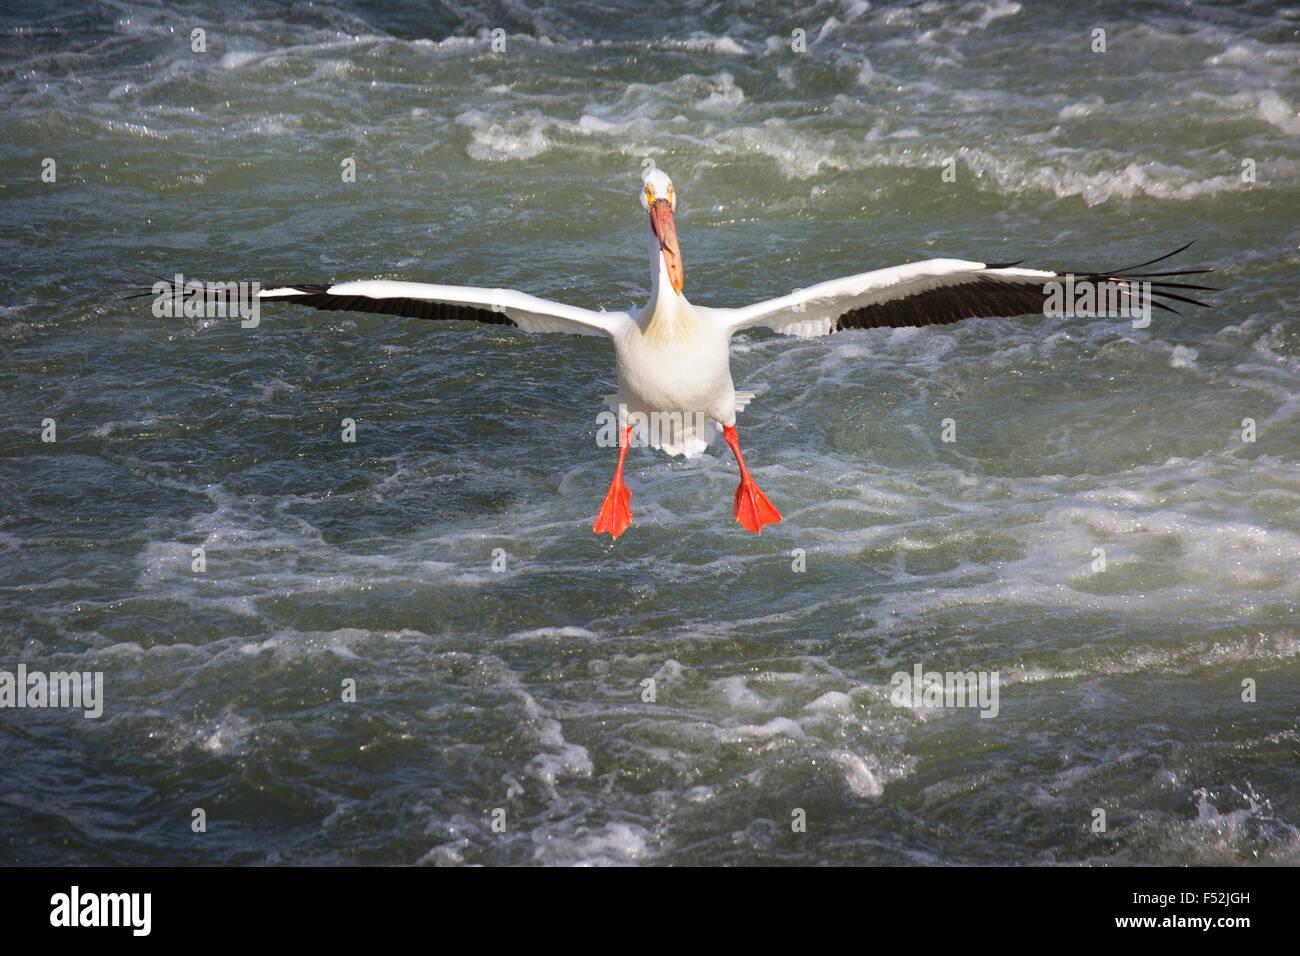 Americano bianco Pellicano (Pelecanus erythrorhynchos) lo sbarco sul Fiume Saskatchewan Immagini Stock